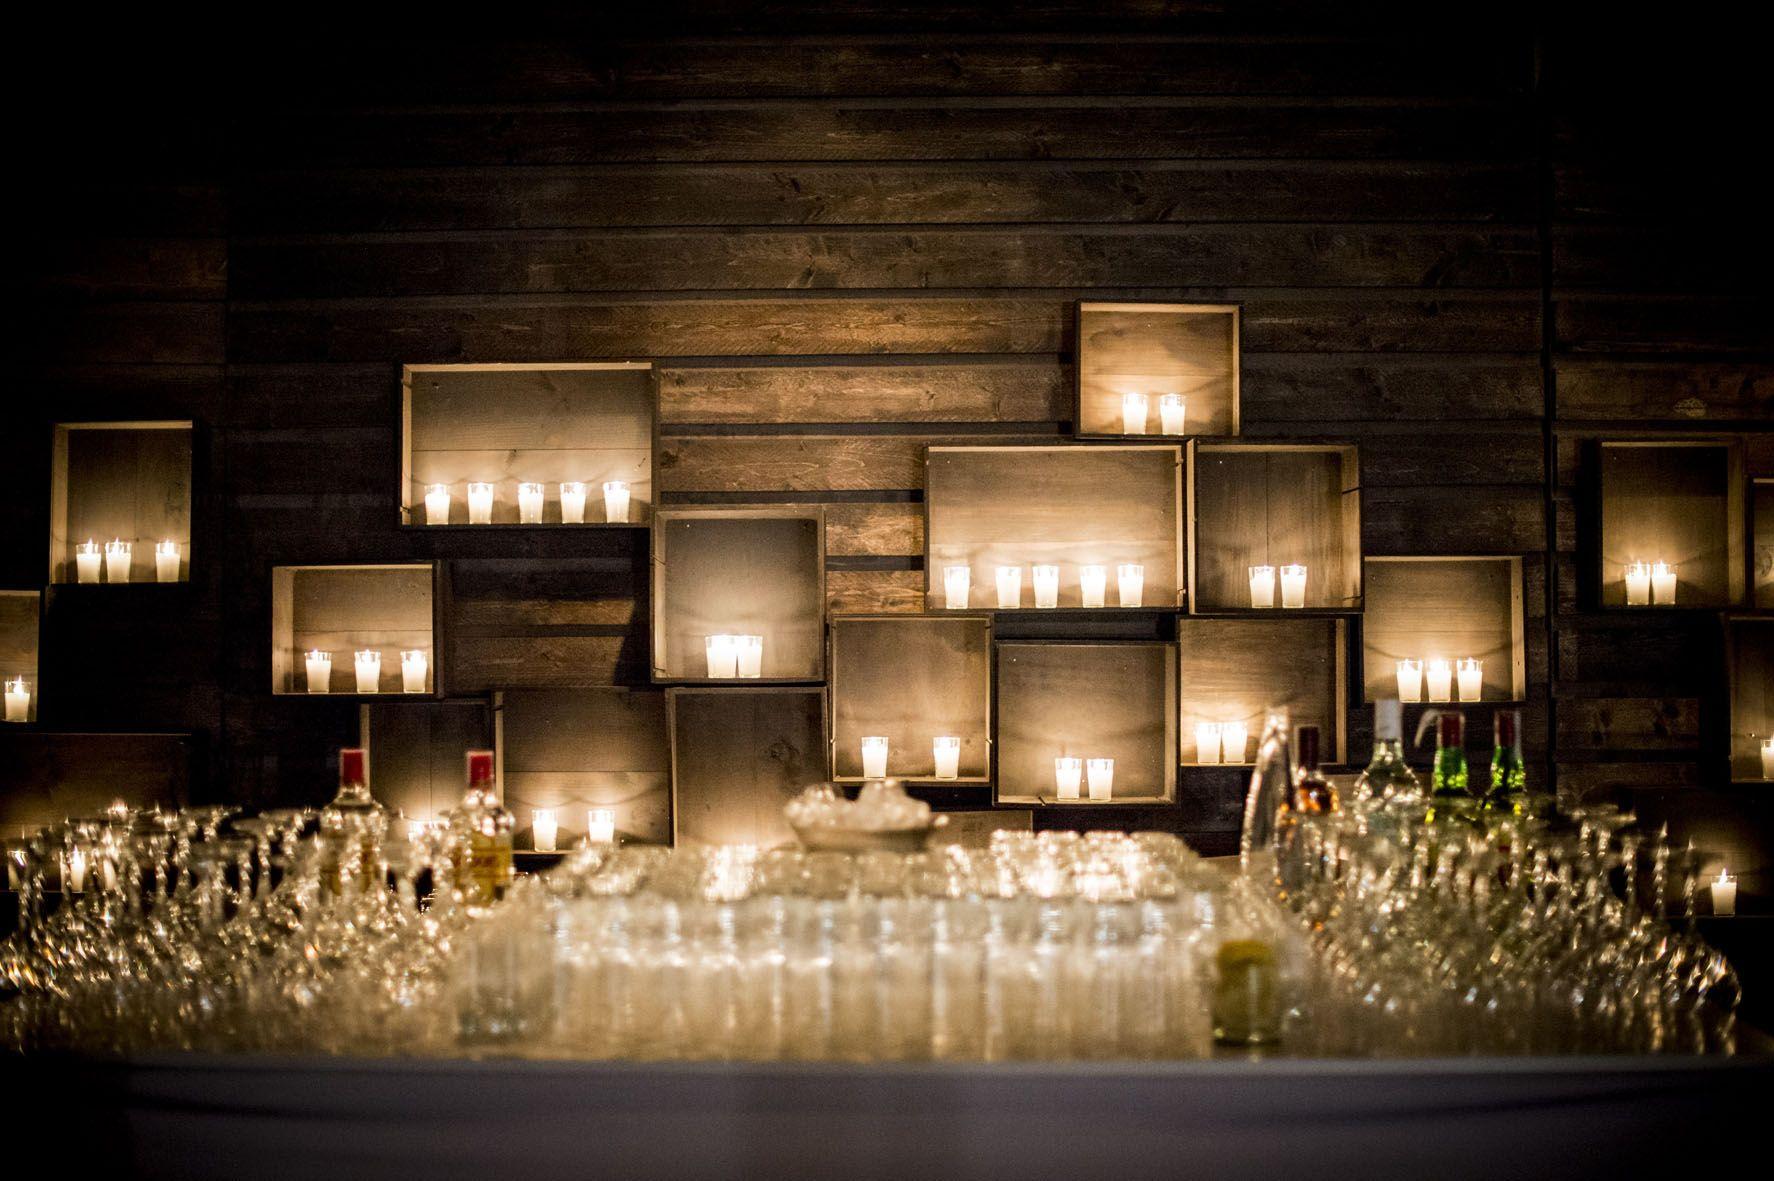 Iluminaci n ideas pinterest iluminaci n caja de - Decoracion iluminacion ...